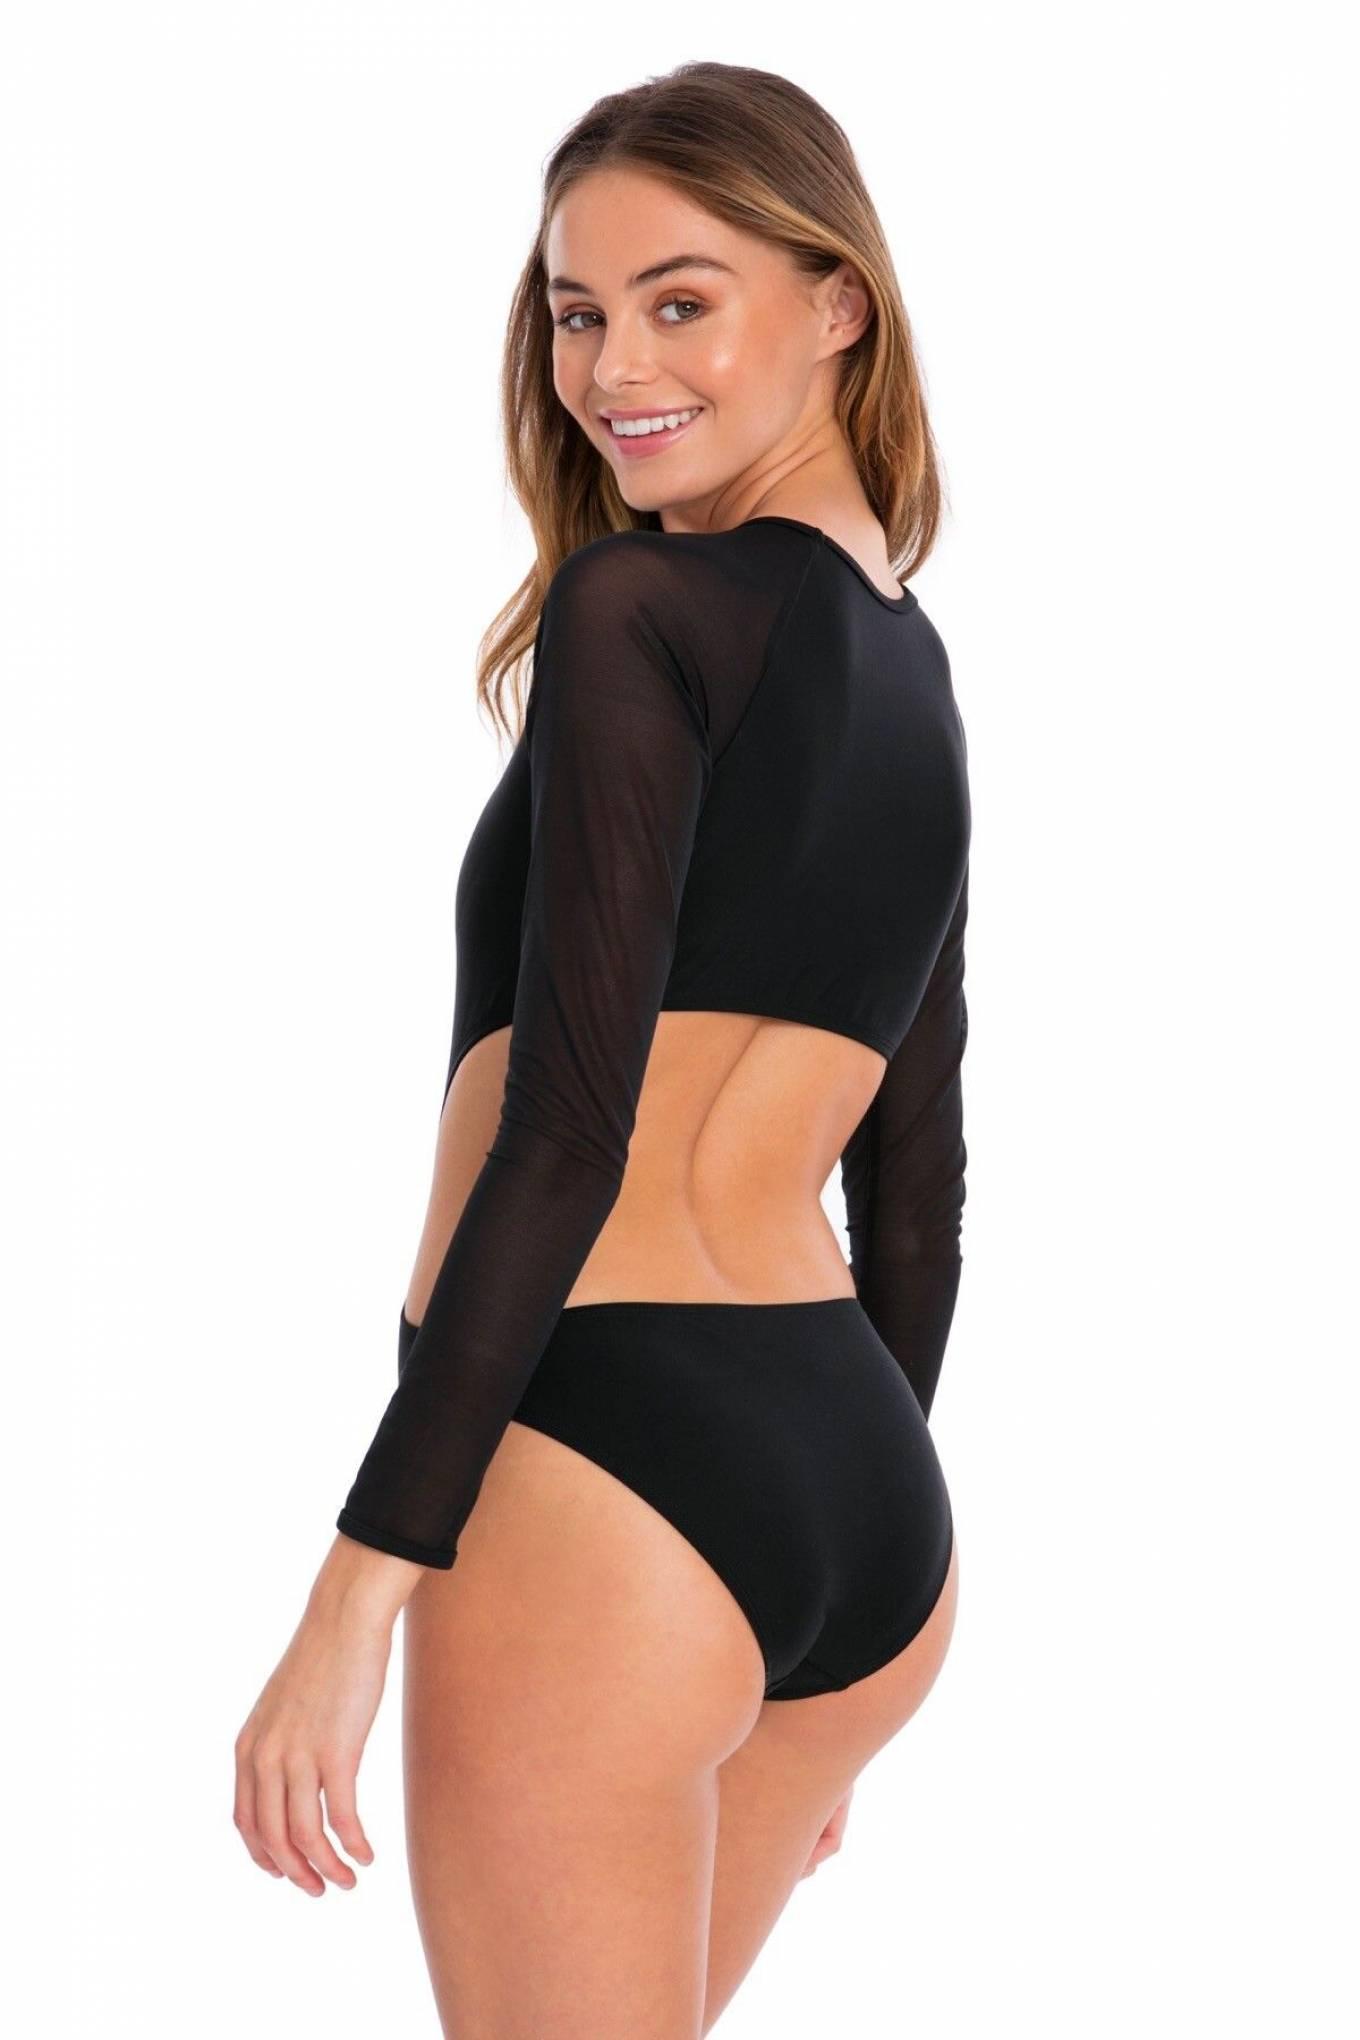 Daniella Beckerman 2020 : Daniella Beckerman – Cabana De Sol Swimwear collection 2020-26